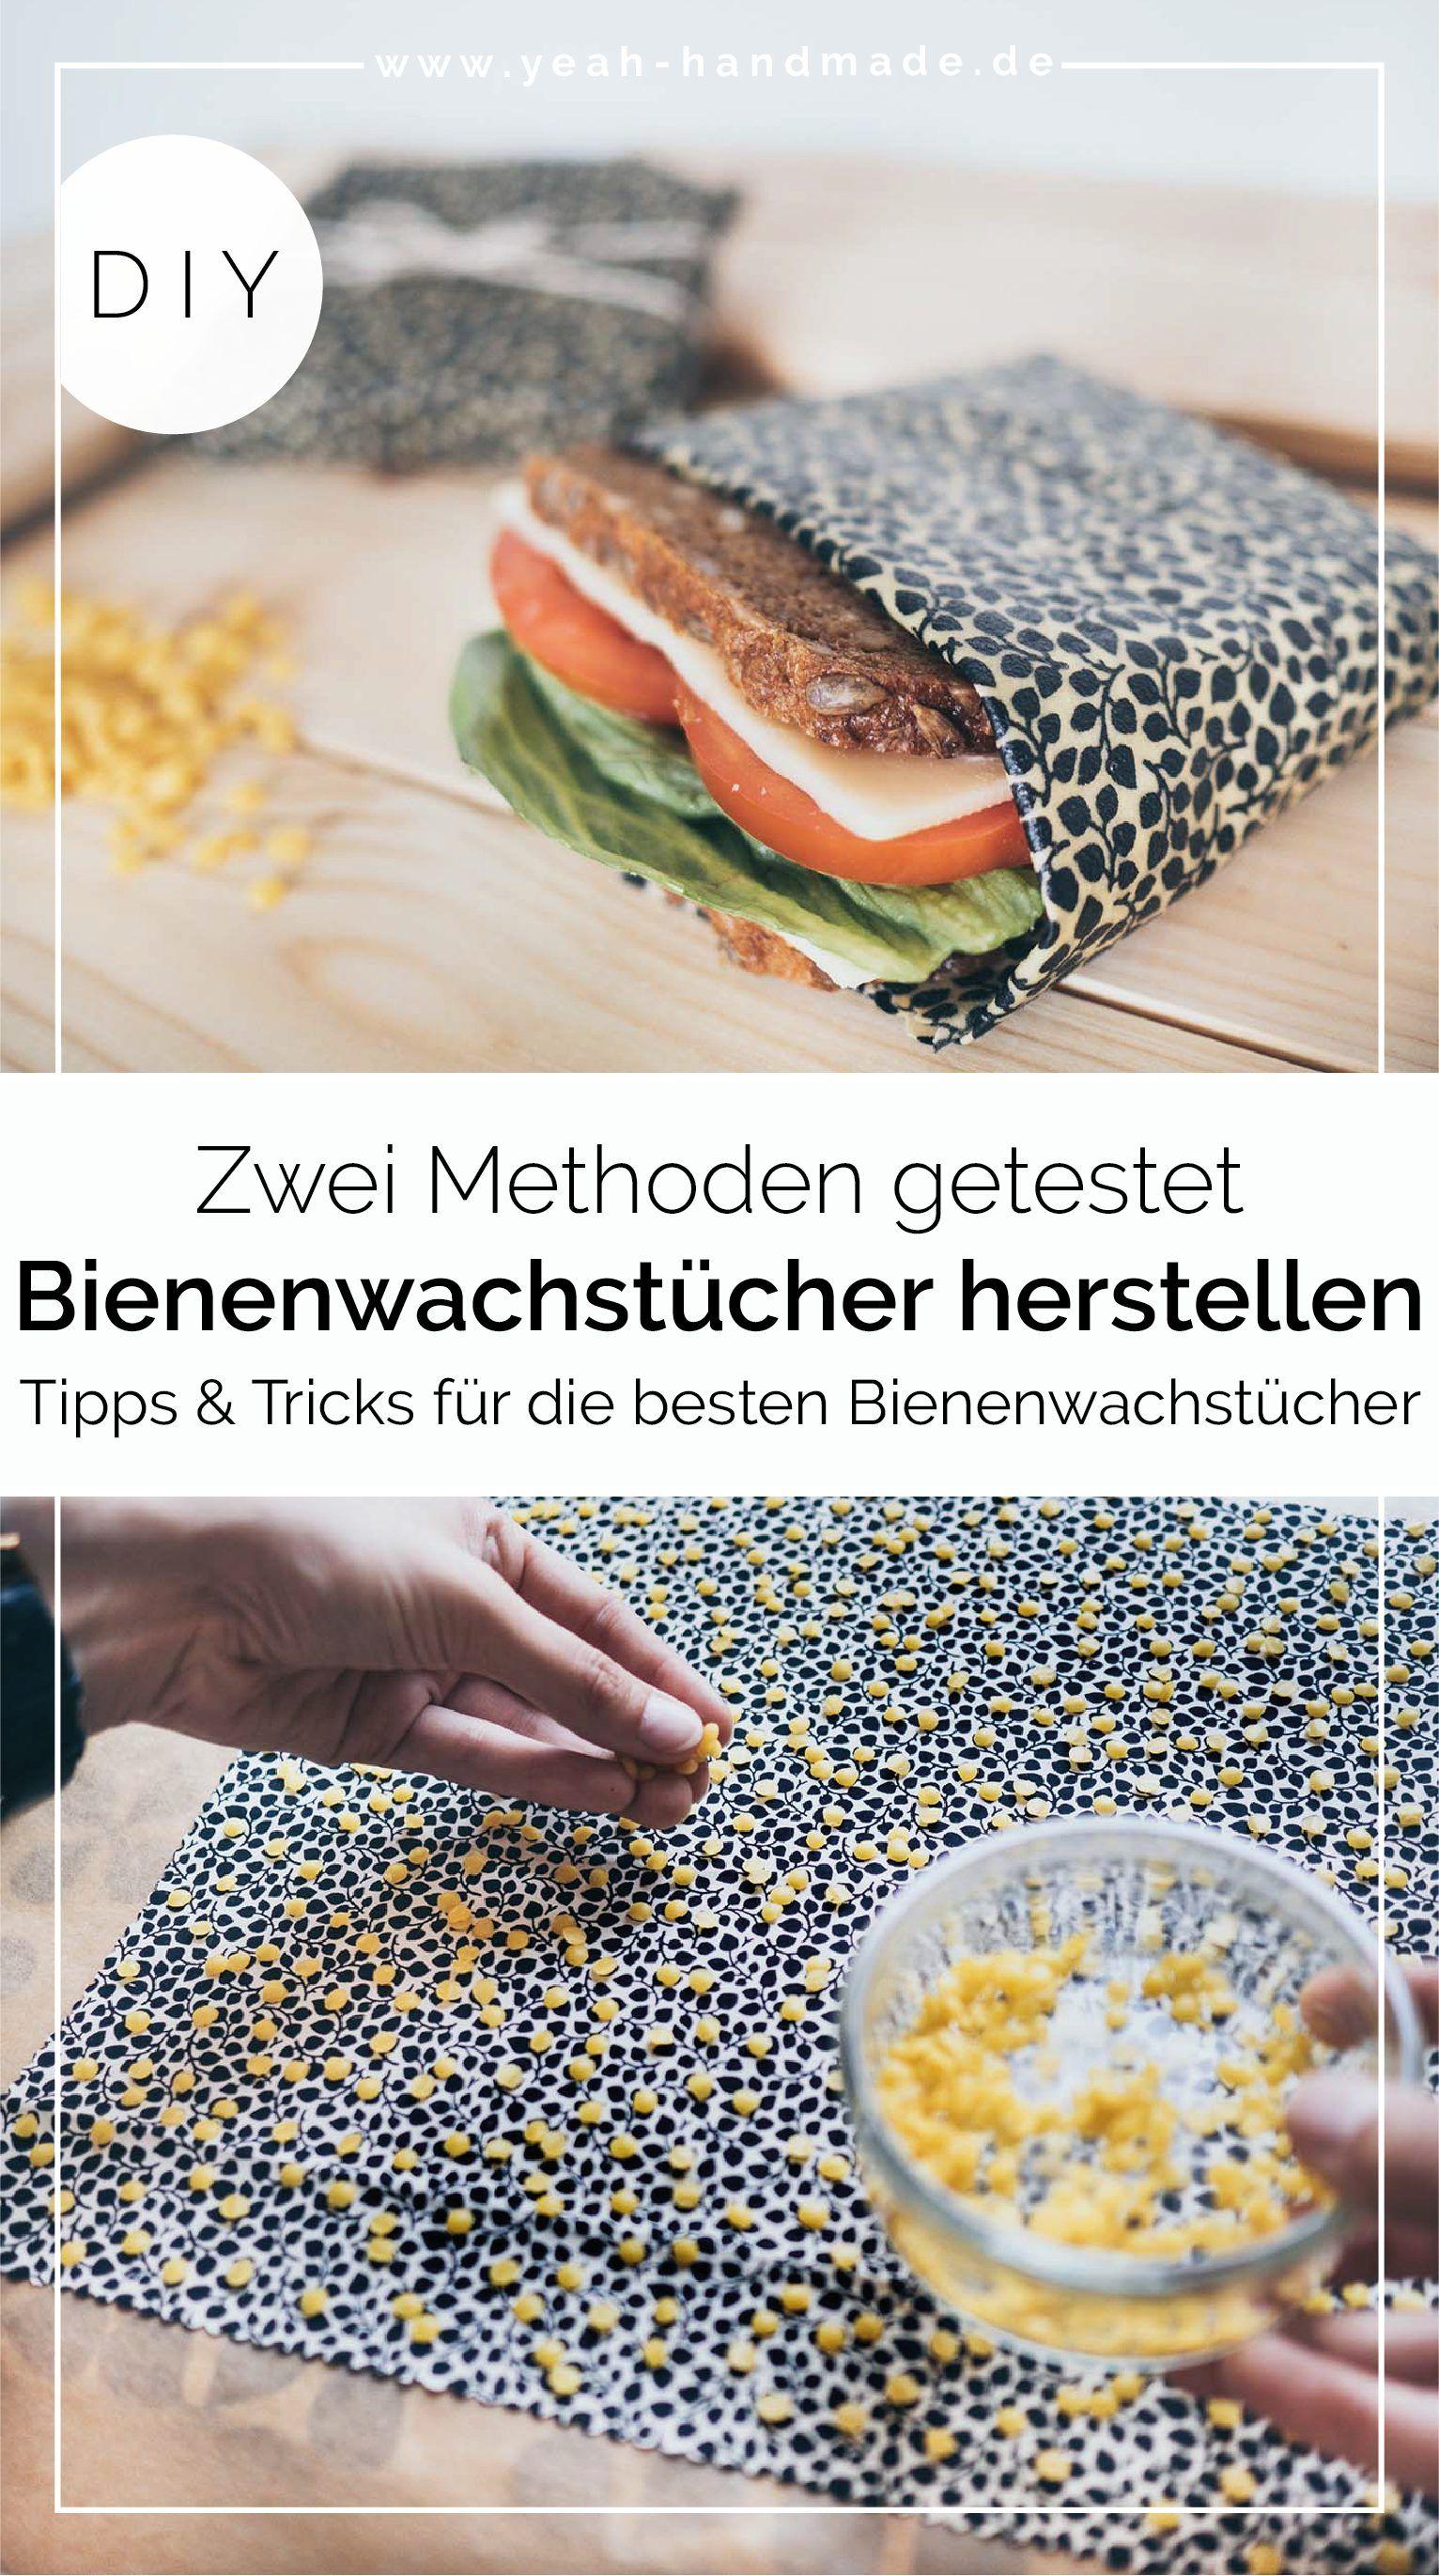 Photo of DIY Bienenwachs Handtücher selbst – zwei Methoden • Ja Handgemacht